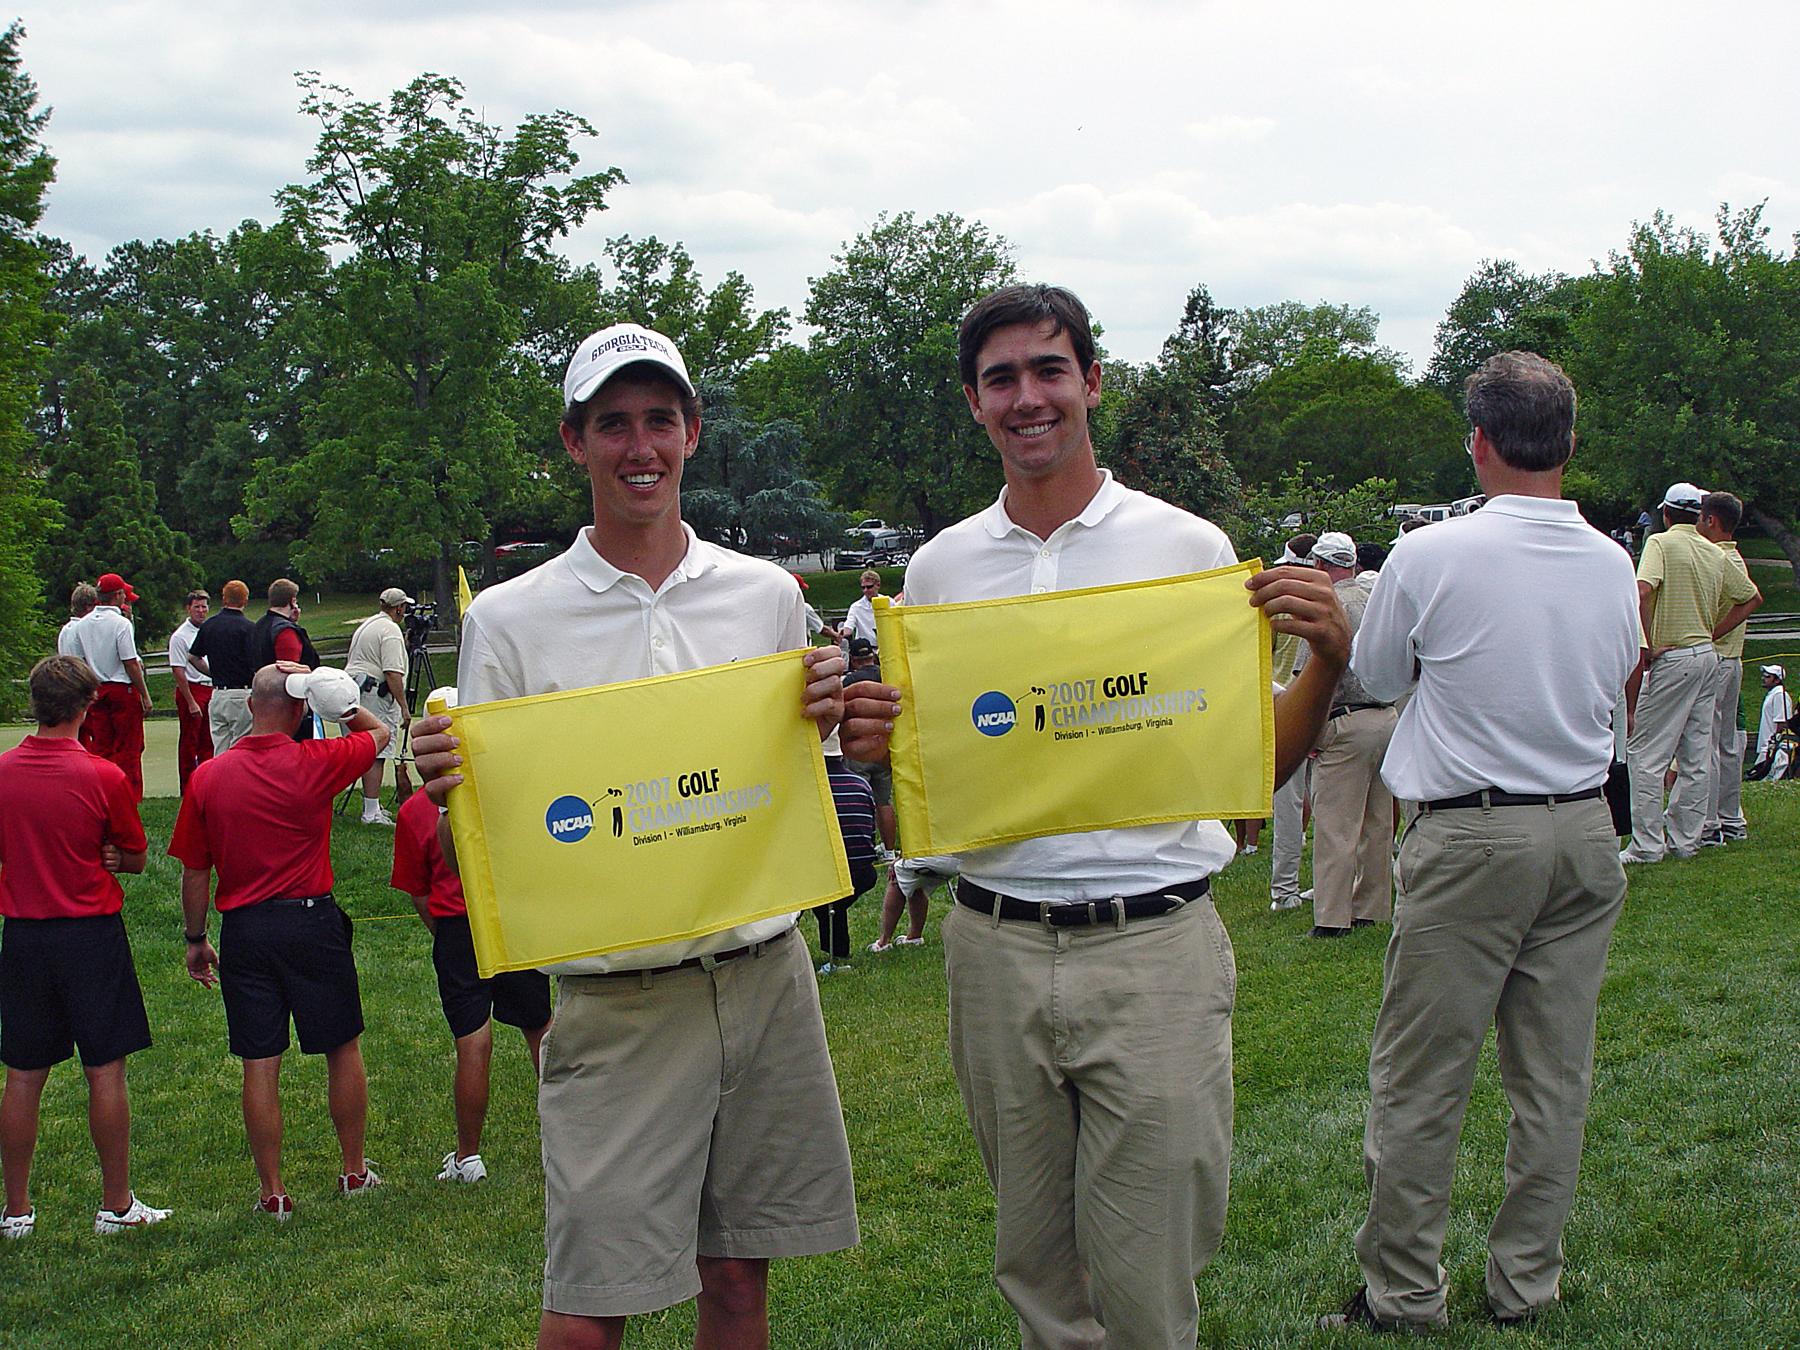 Chesson Hadley, Cameron Tringale - Georgia Tech golf